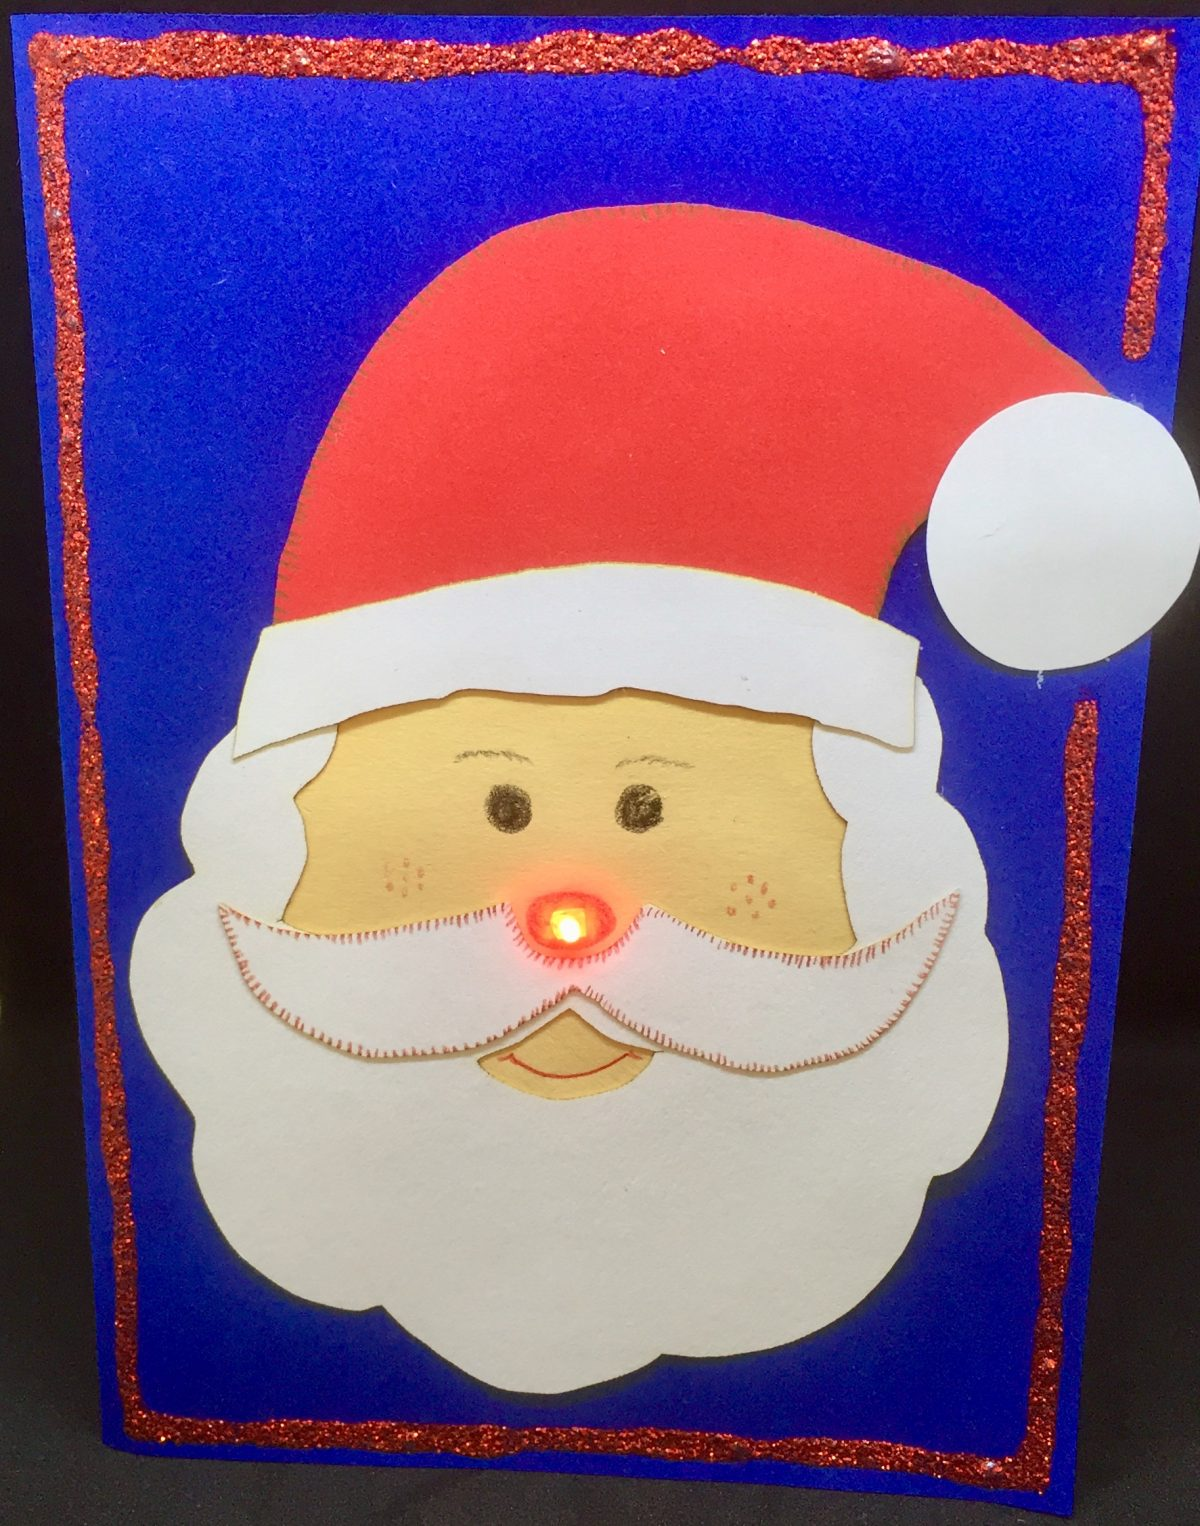 http://blog.forschenfuerkinder.de/2017/12/15/leuchtende-weihnachtskarten/ Weihnachtskarte Weihnachtsmann LED Stromkreis